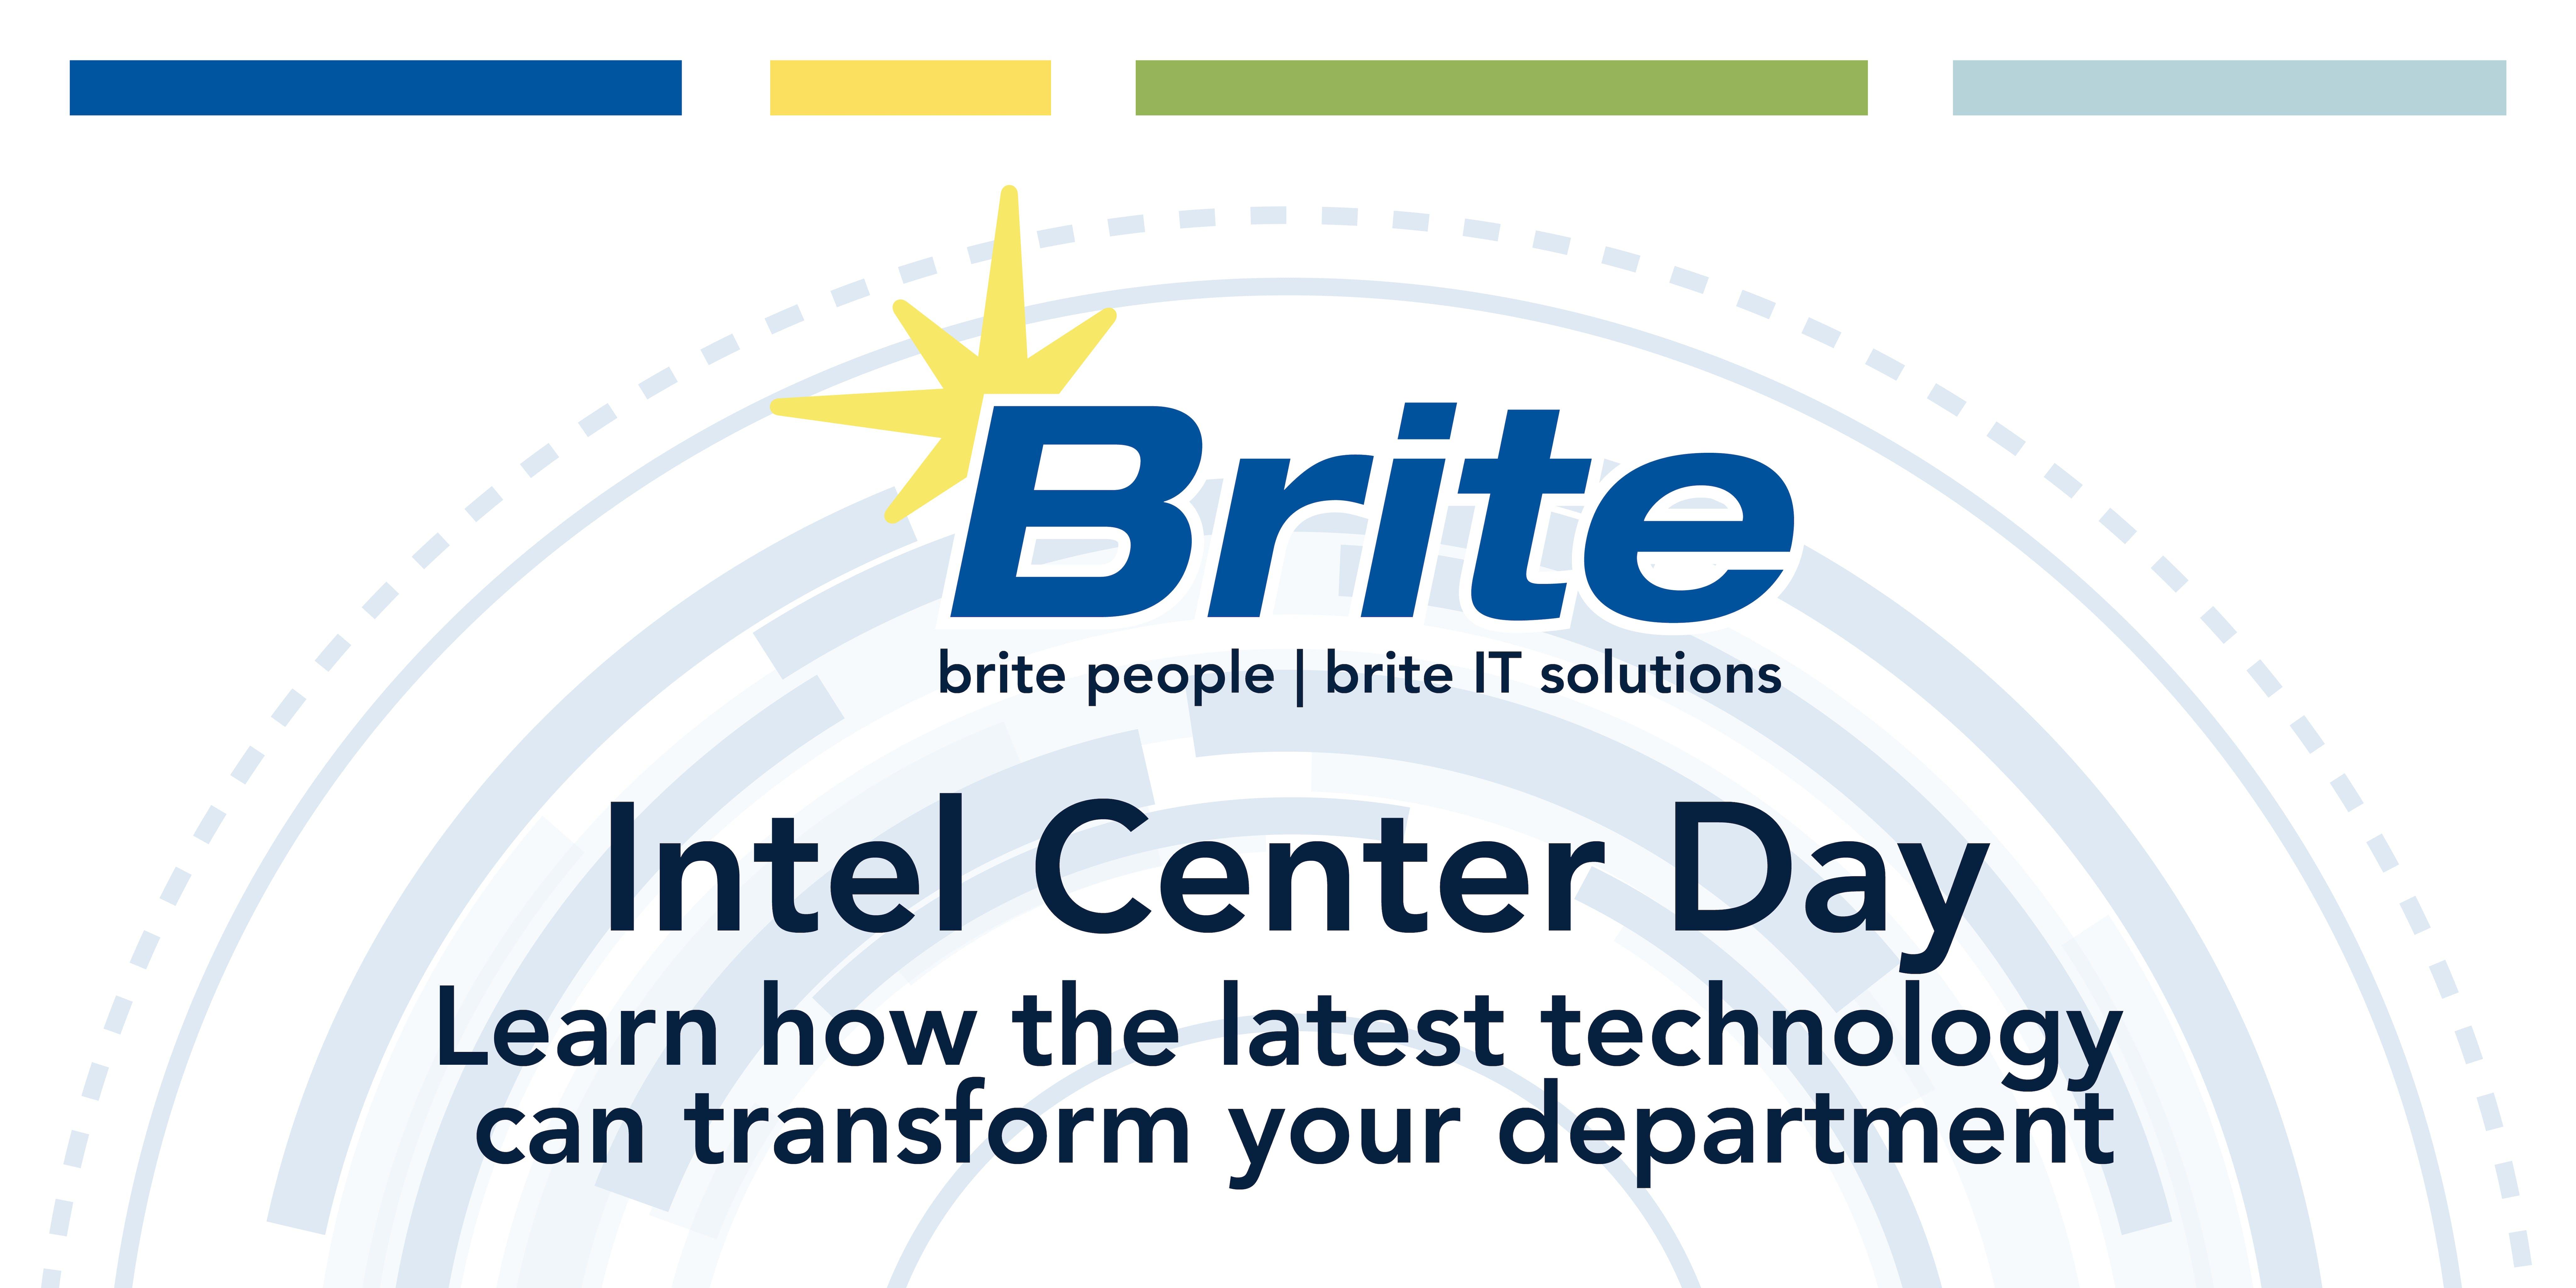 Brite's Intel Center Day